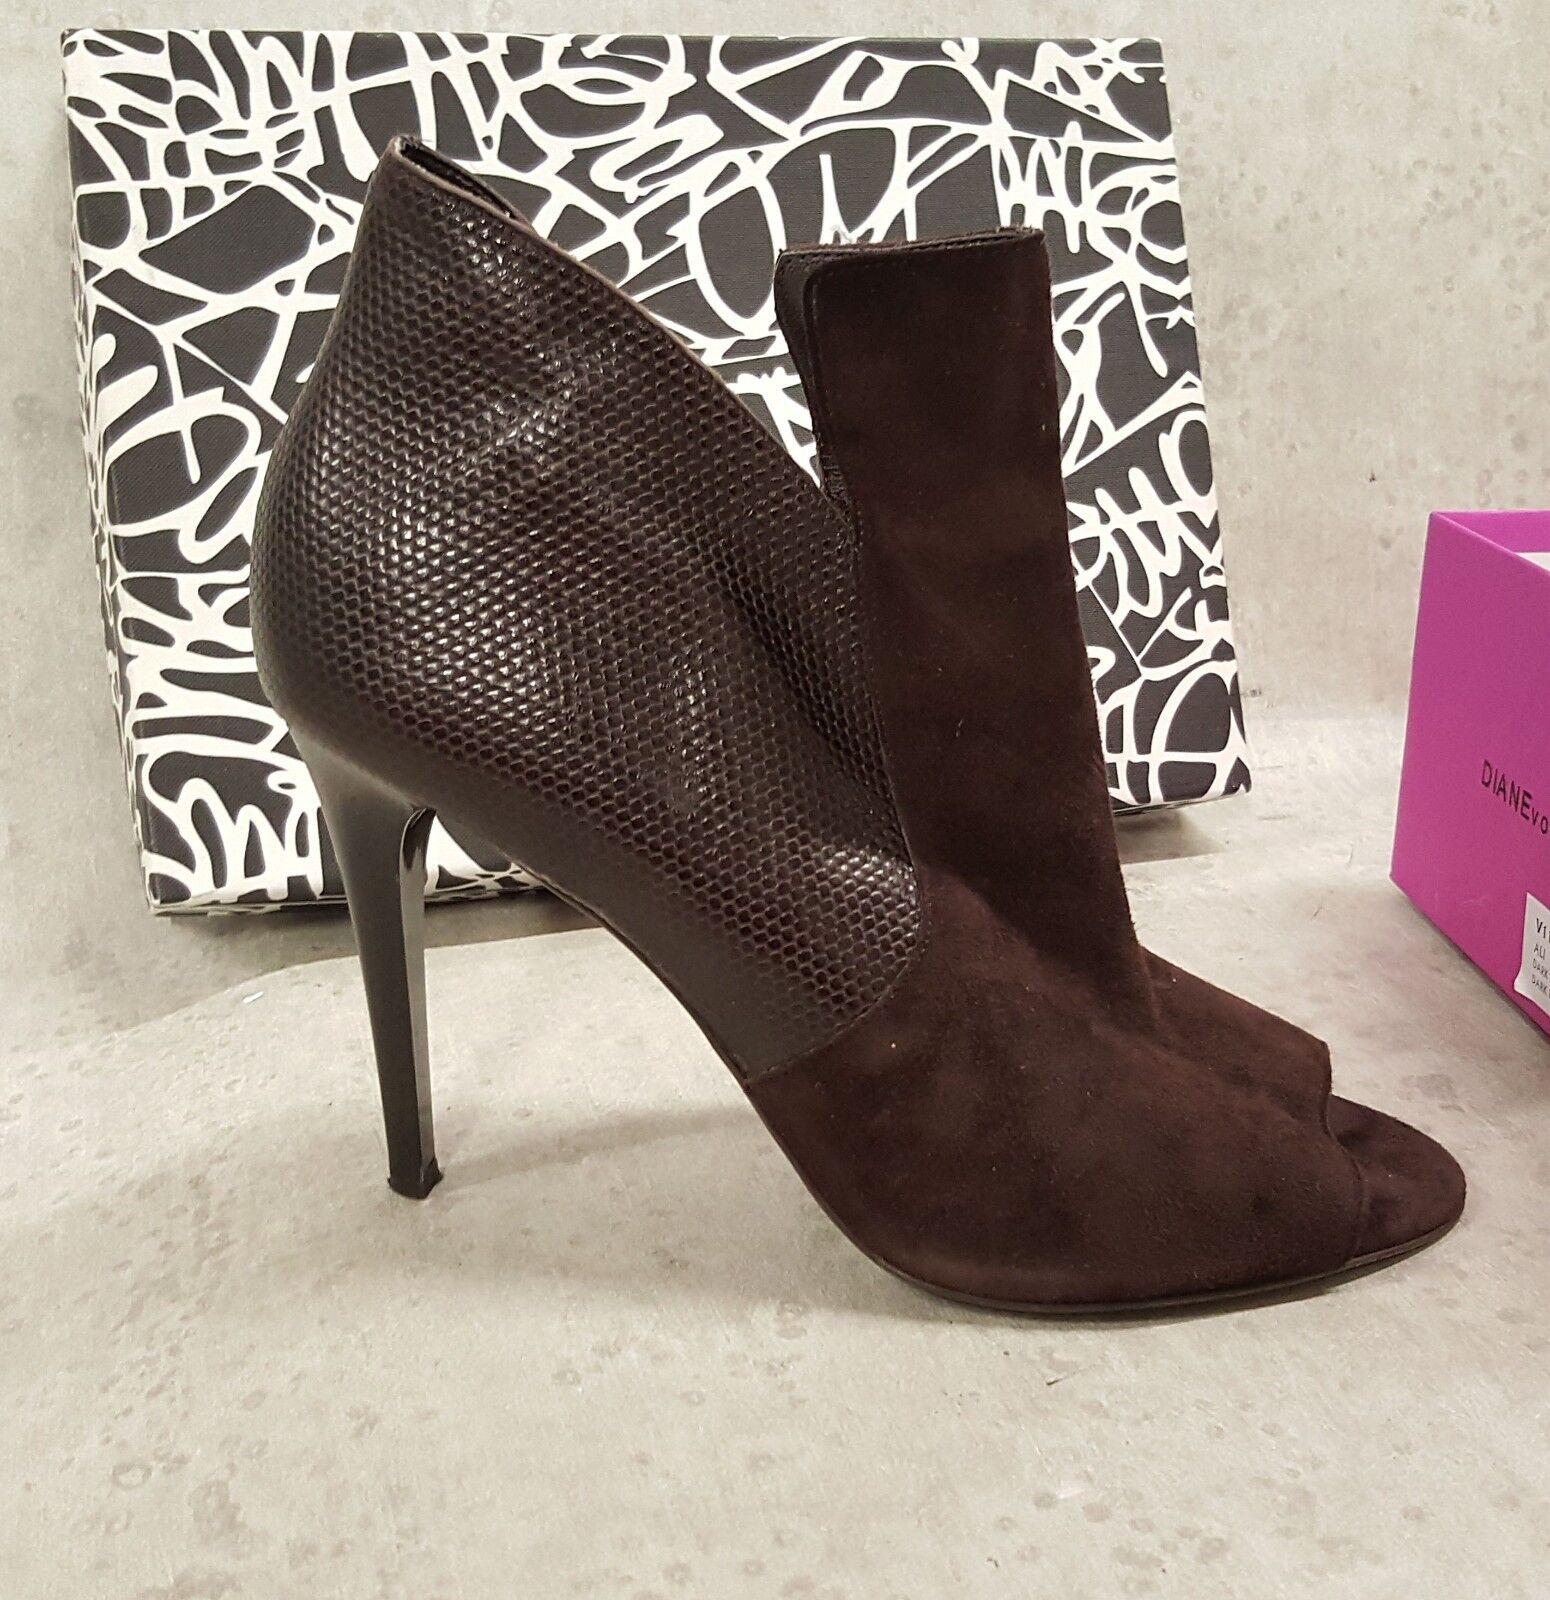 Diane Von Furstenberg boot booties high heels ALI  ALI heels sz 10 B NEW IN BOX a721d9